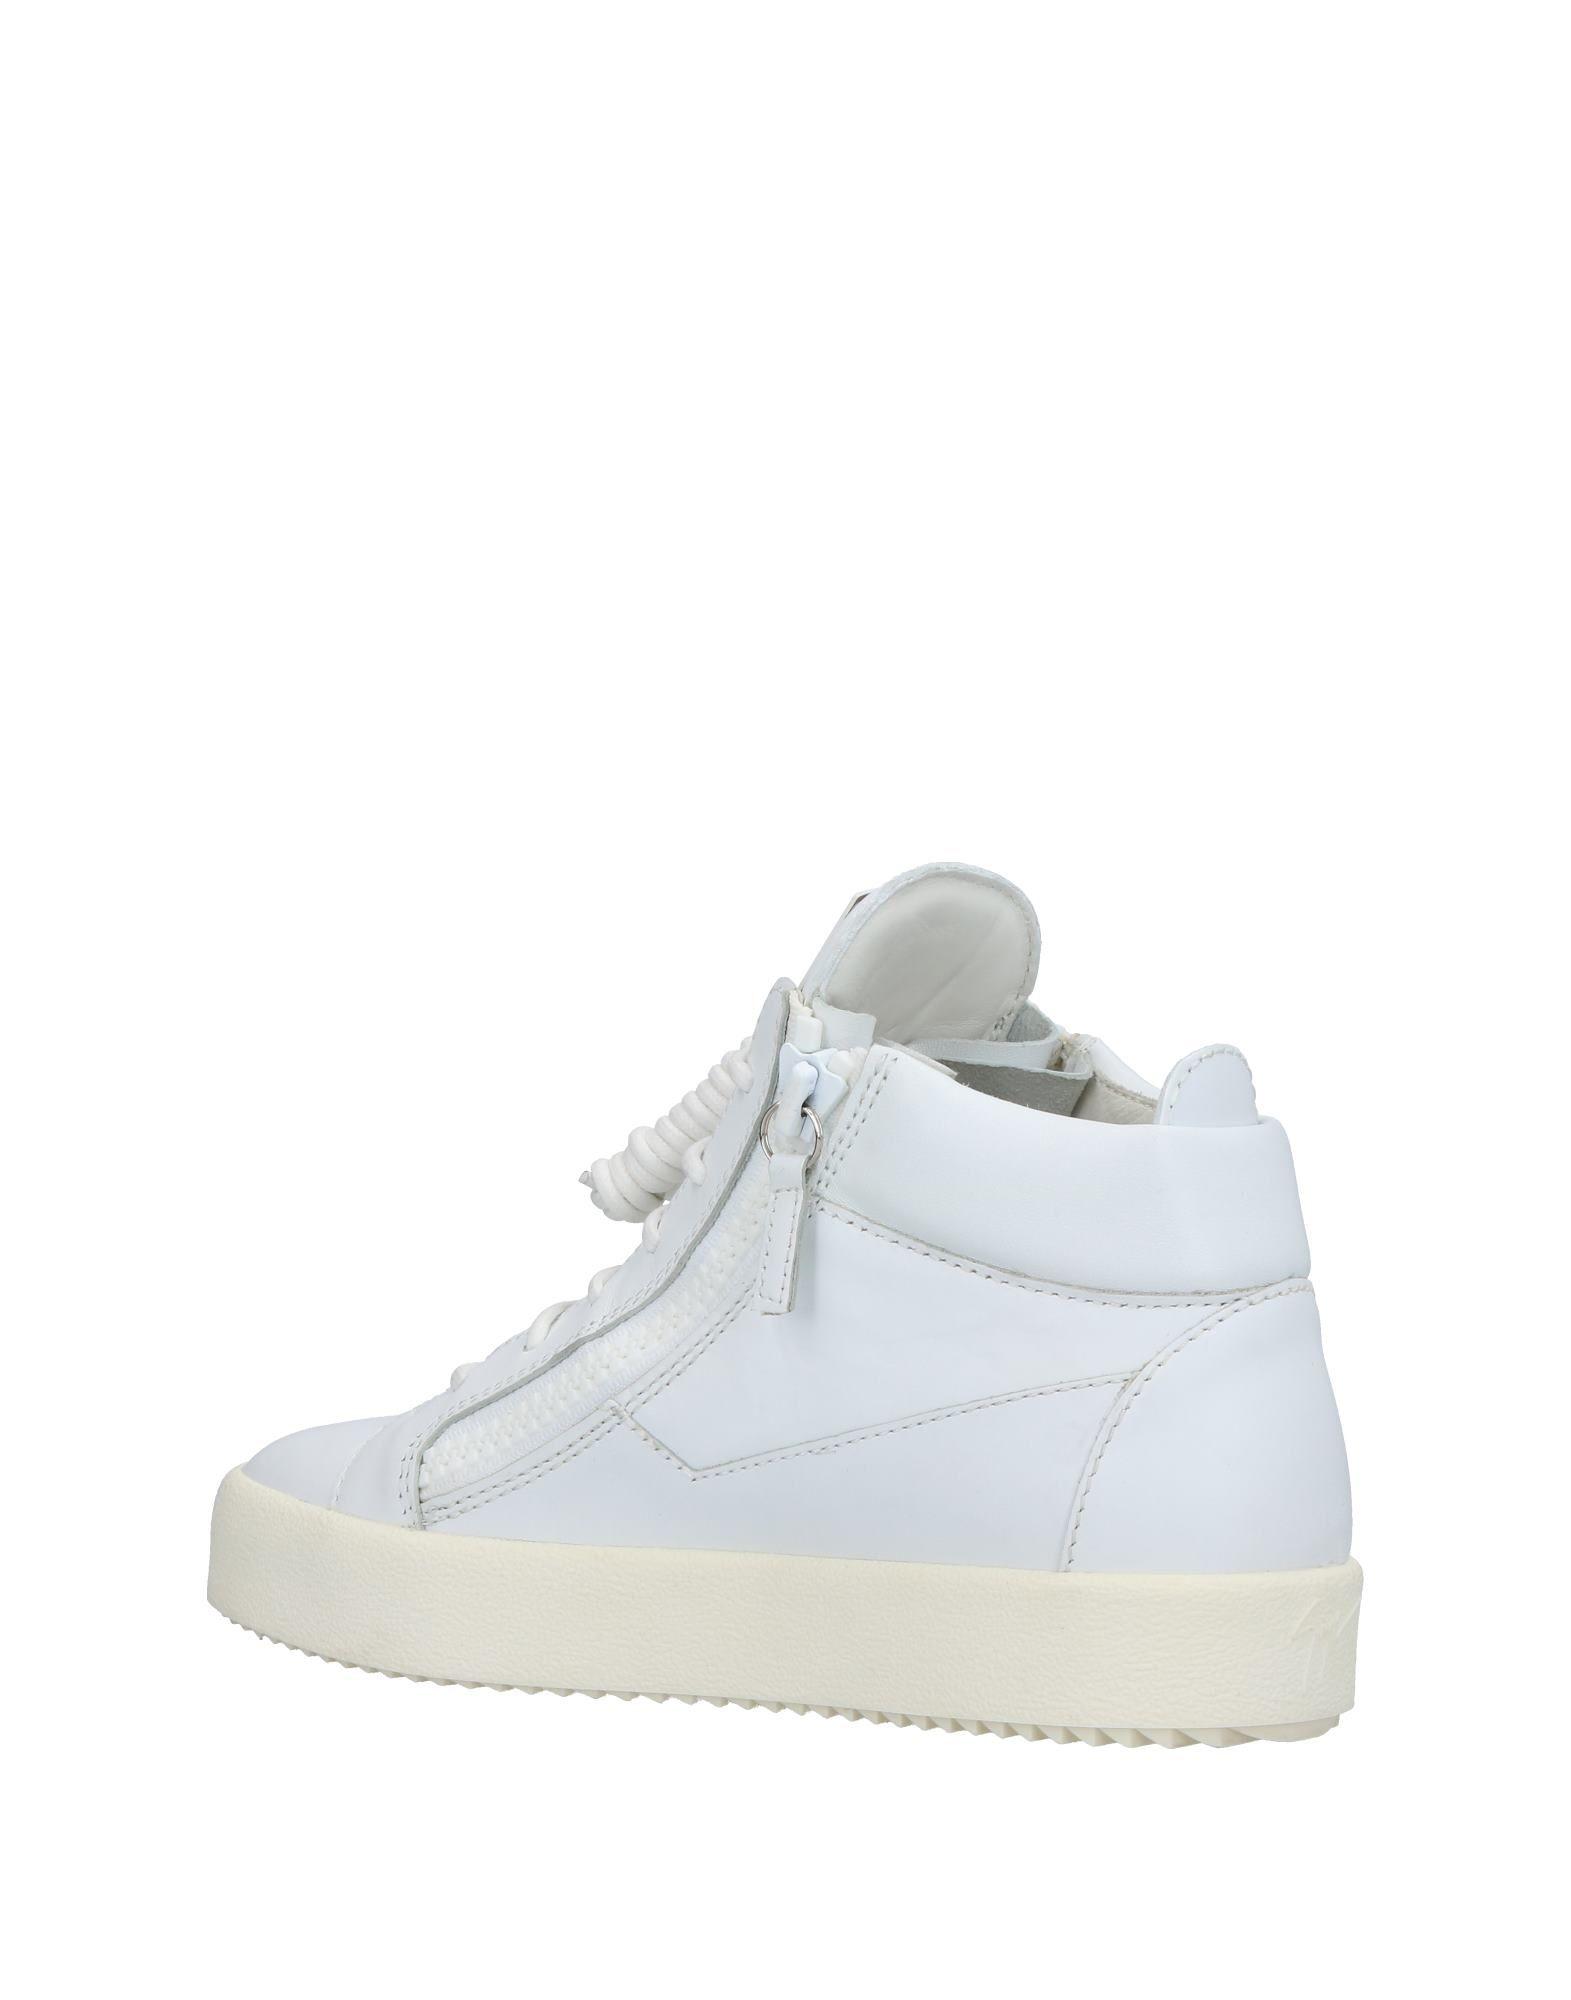 Giuseppe Zanotti  Sneakers Damen  Zanotti 11394761DV Beliebte Schuhe 327742